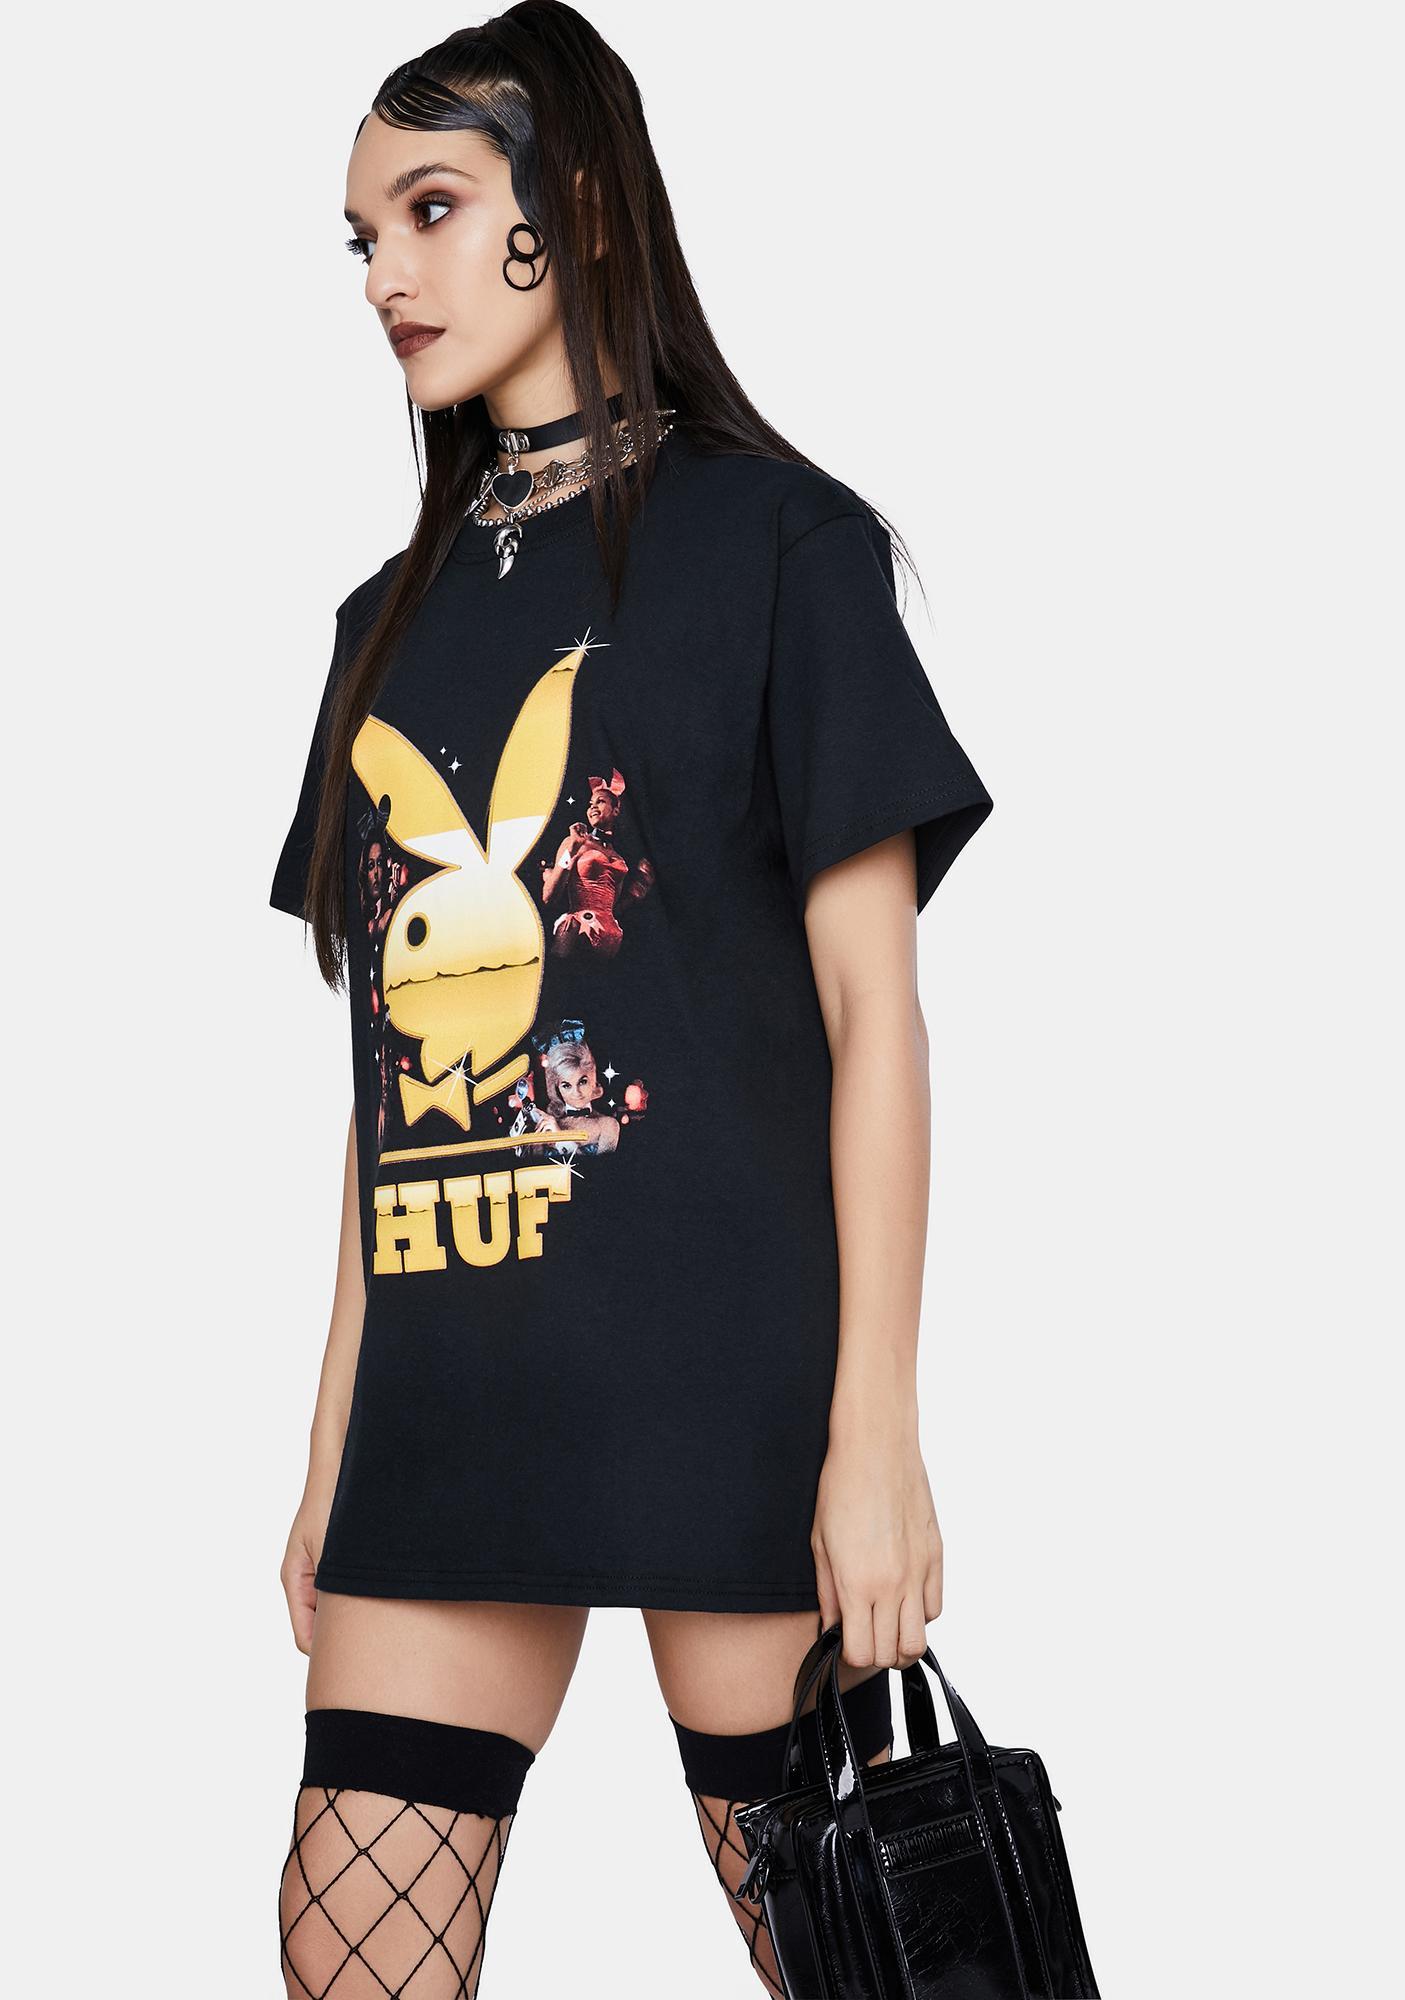 HUF x Playboy Club Tour Graphic Tee